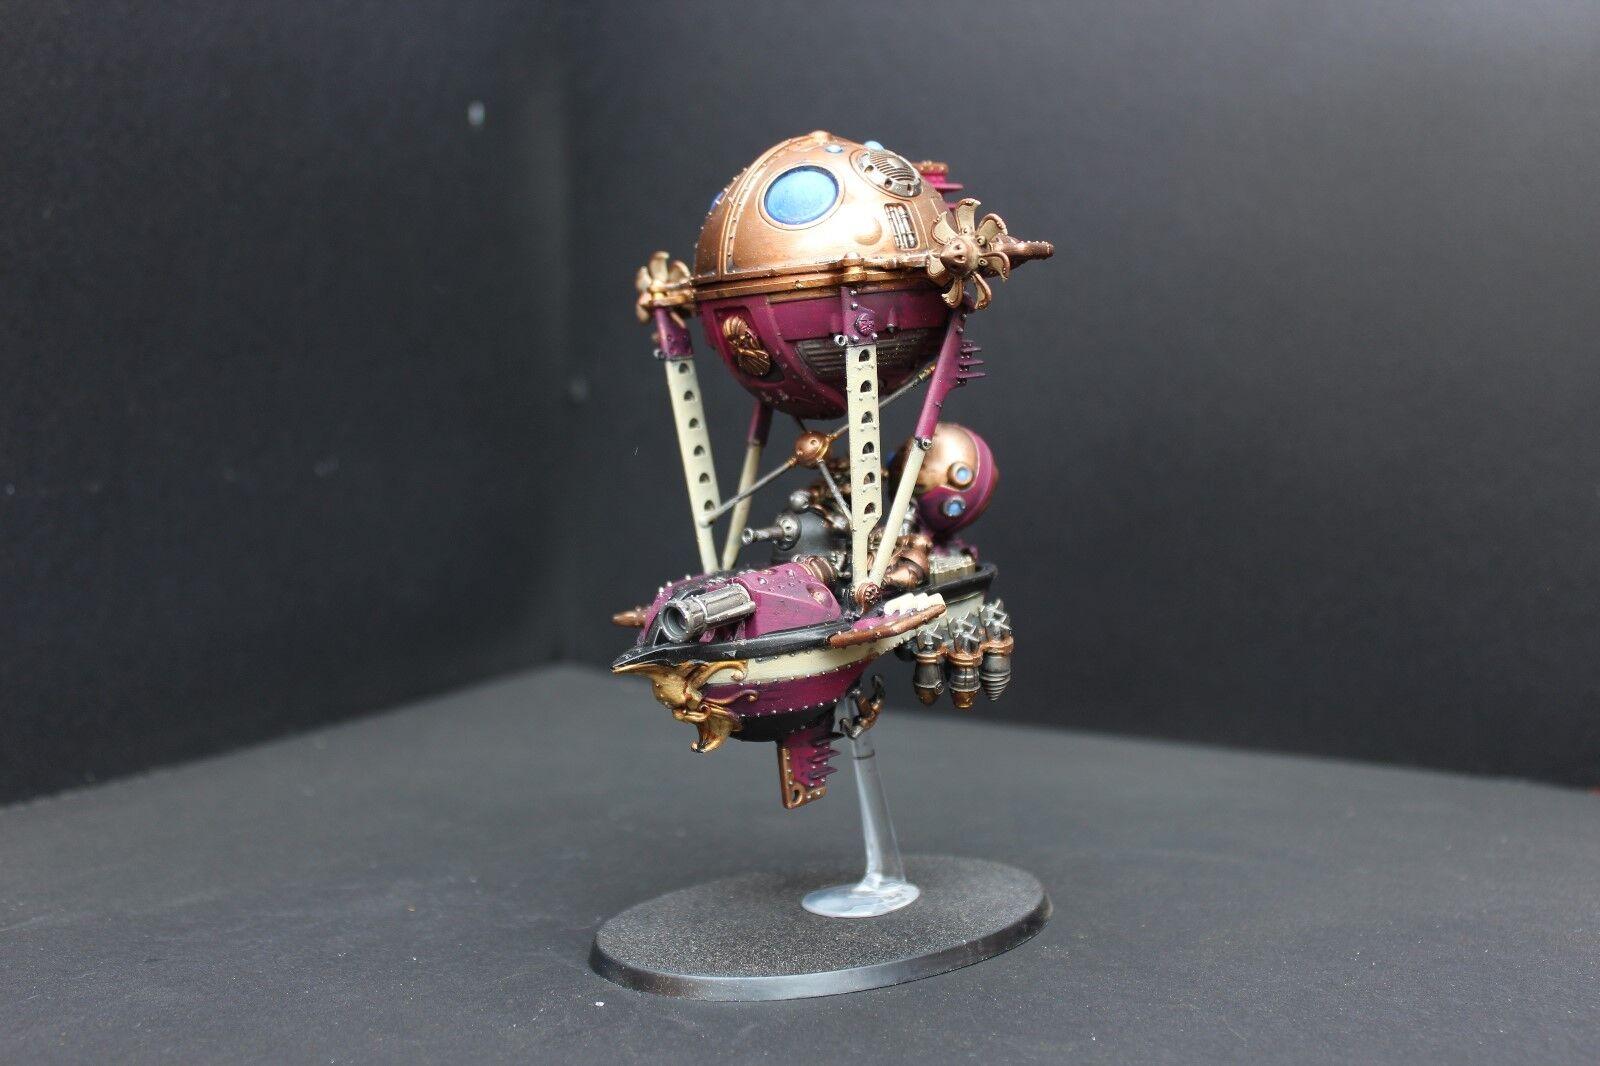 Warhammer kharadron overlords Grundstok Gunhauler  pro painted made to order